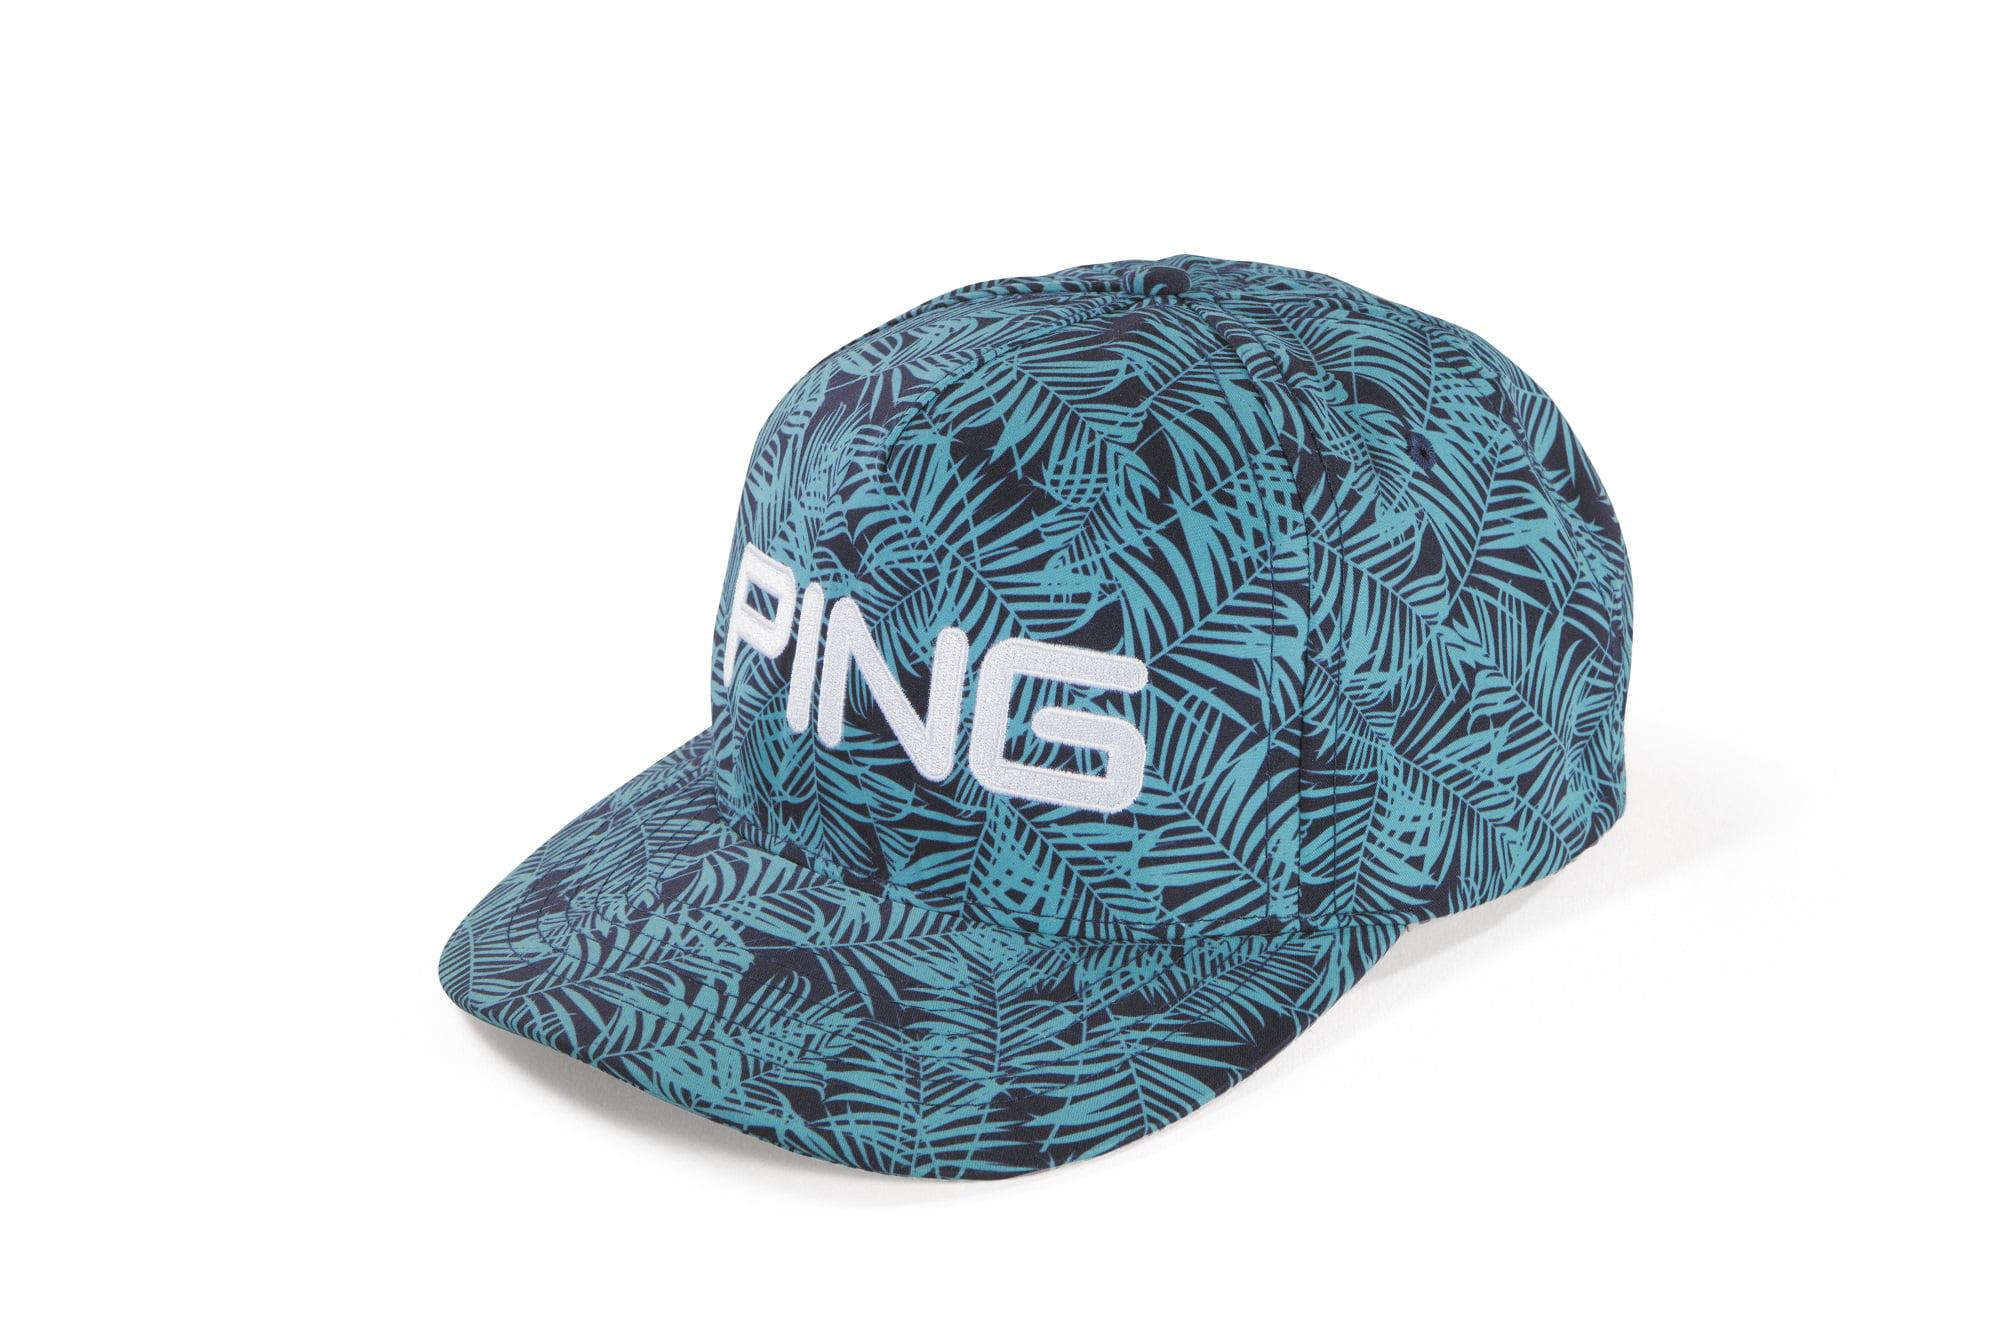 PING PALM HAT LIMITED EDITION ADJUSTABLE GOLF MENS CAP - NEW 2017 -  Walmart.com 396f3a47d59